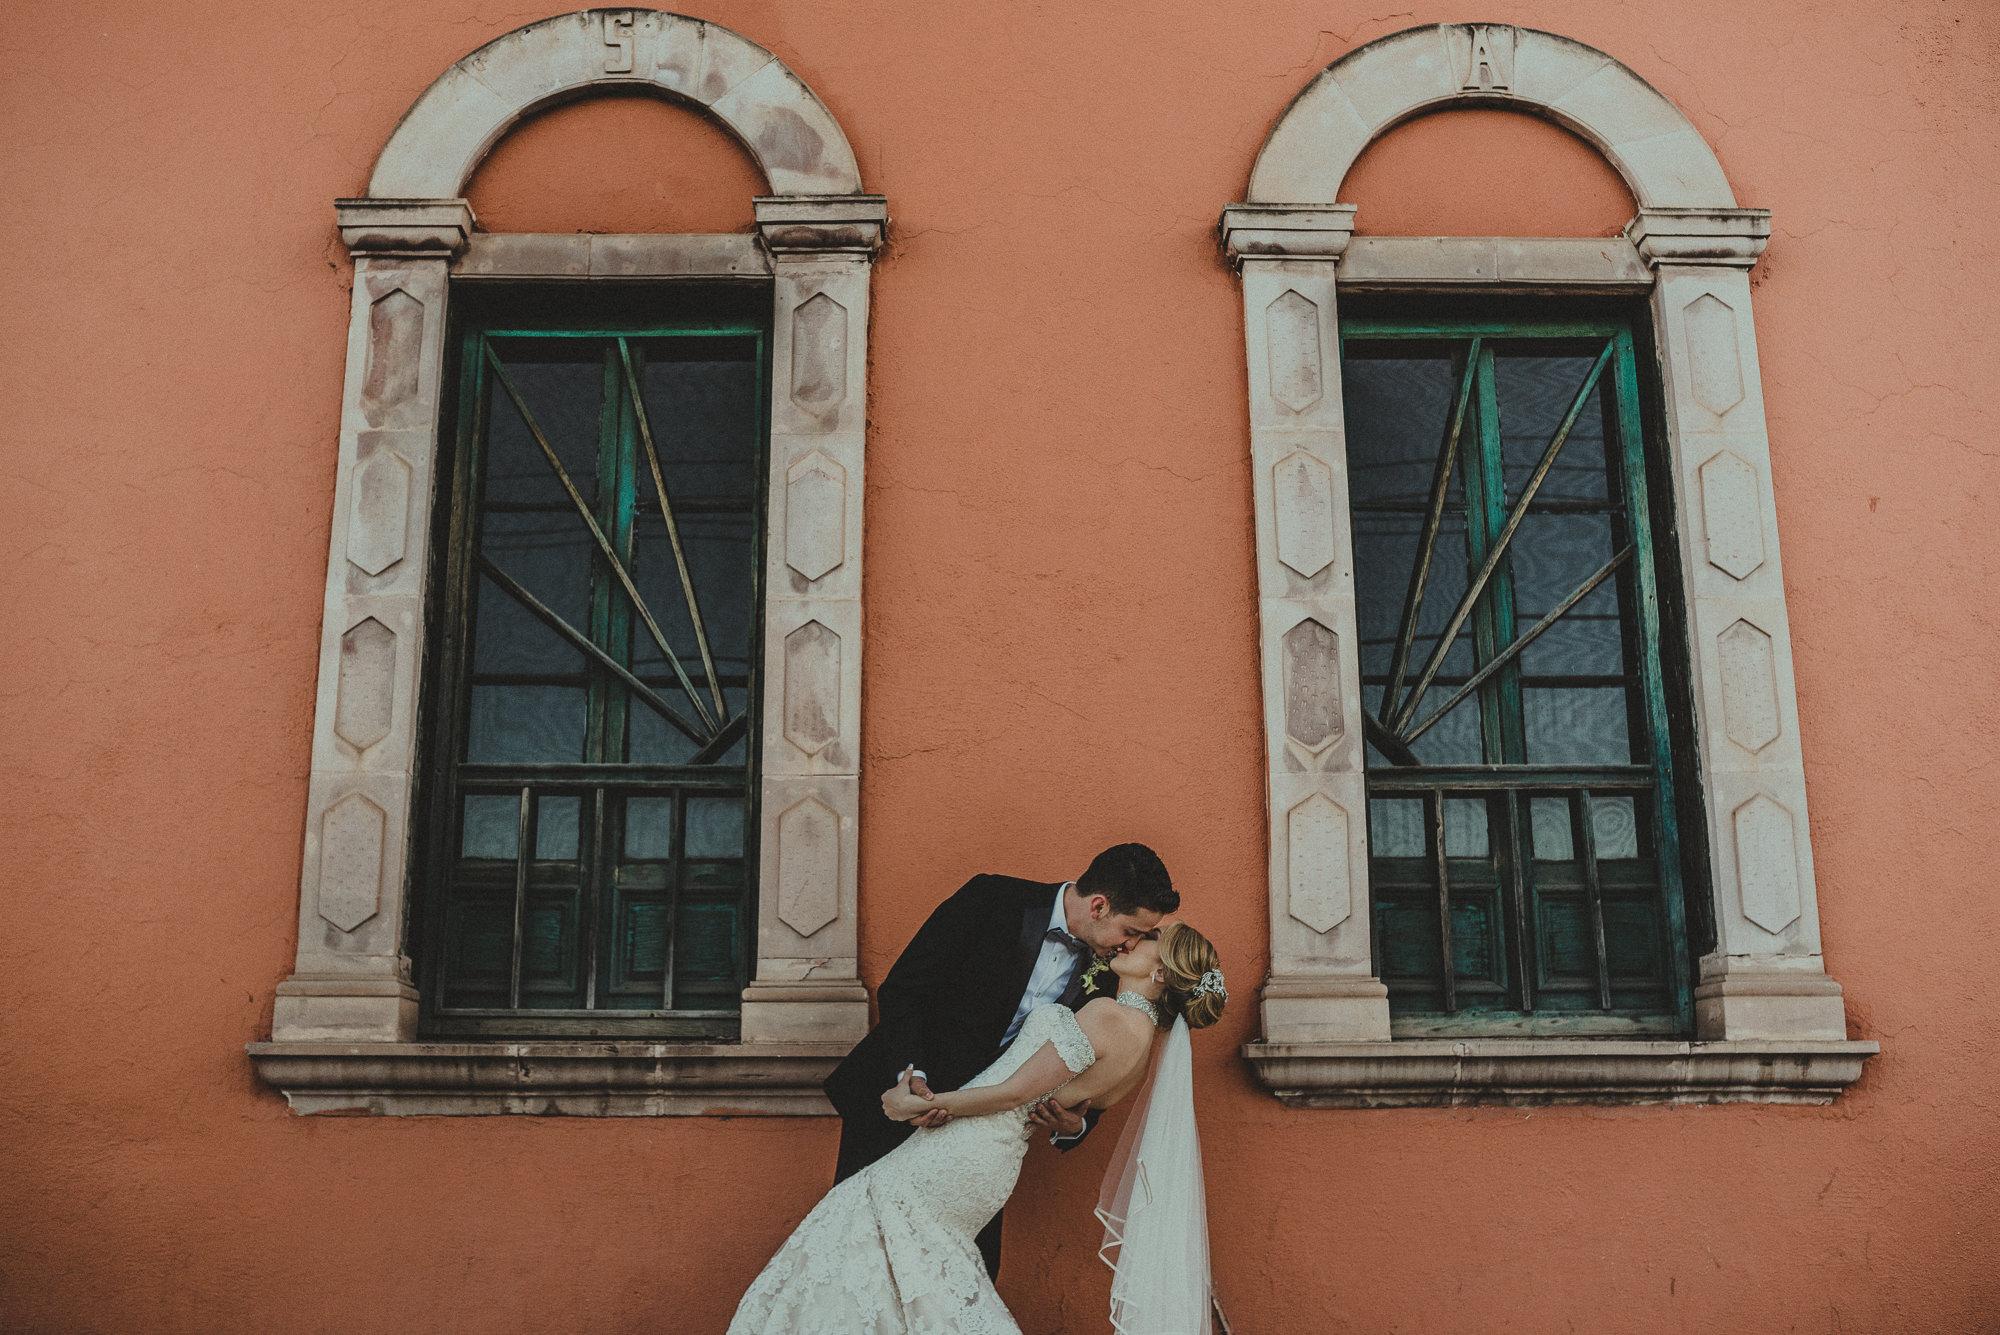 Mario-Karla-Wedding-126